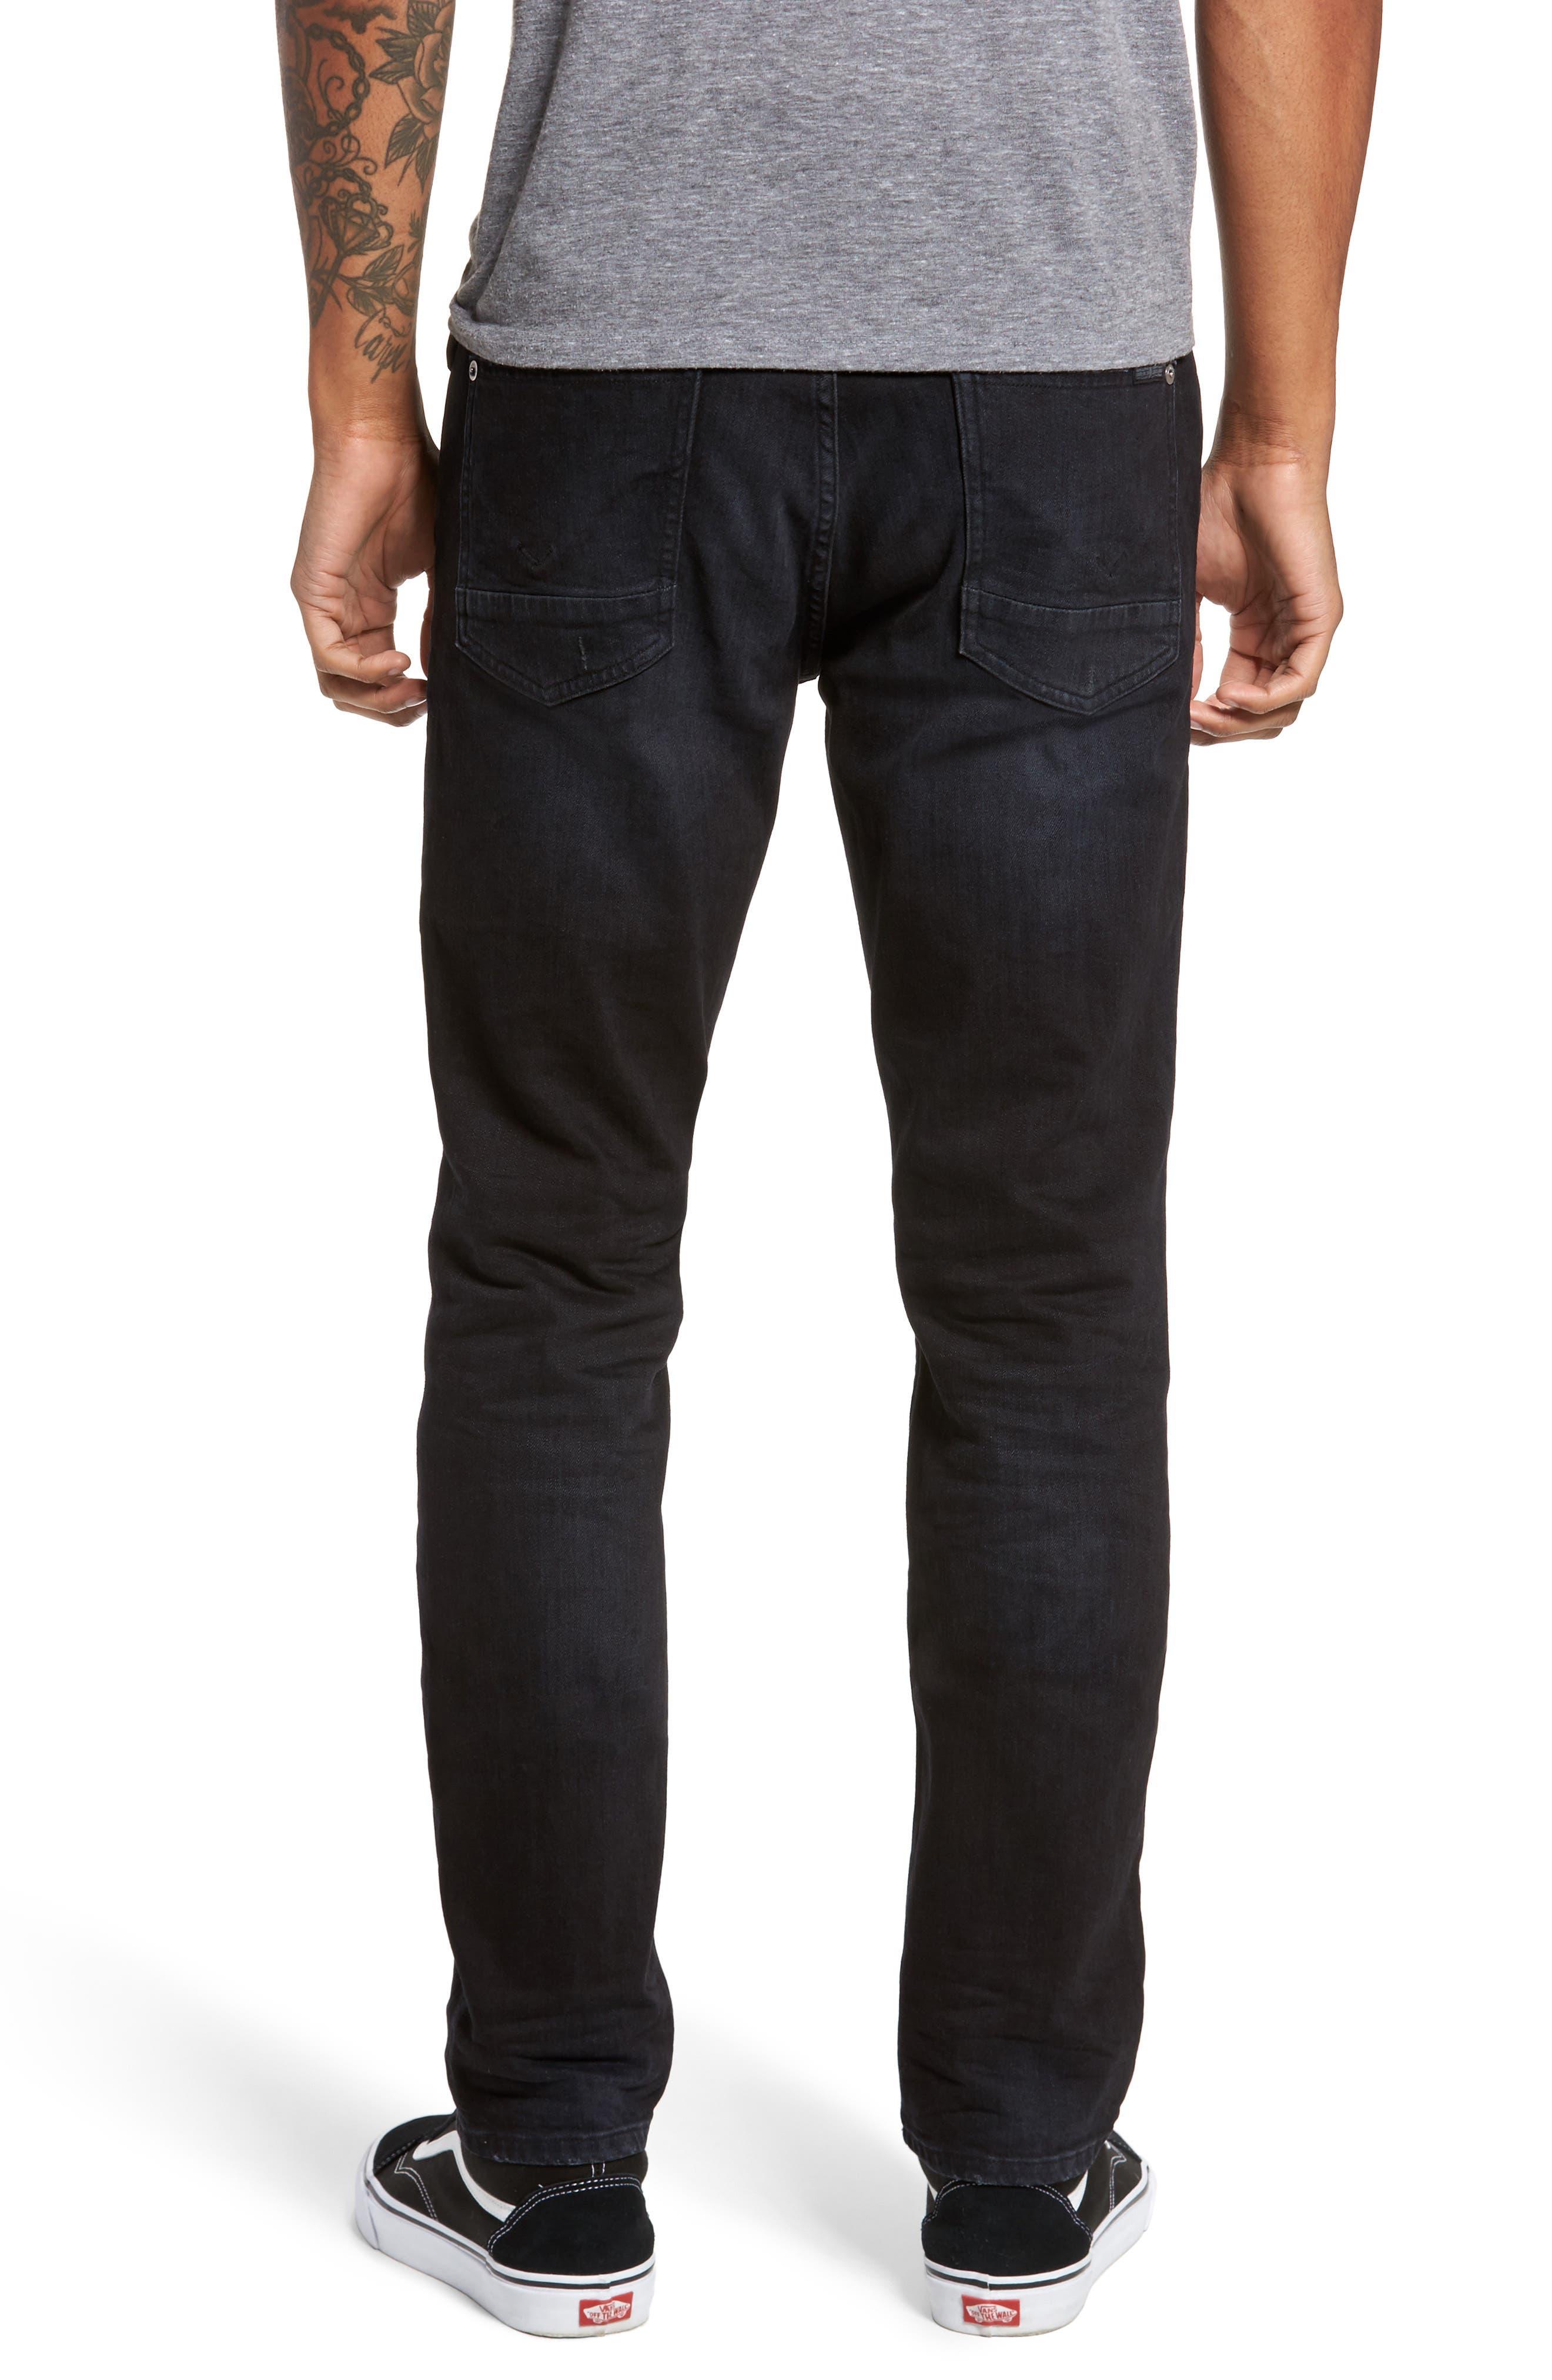 Sartor Skinny Fit Jeans,                             Alternate thumbnail 2, color,                             Low Key